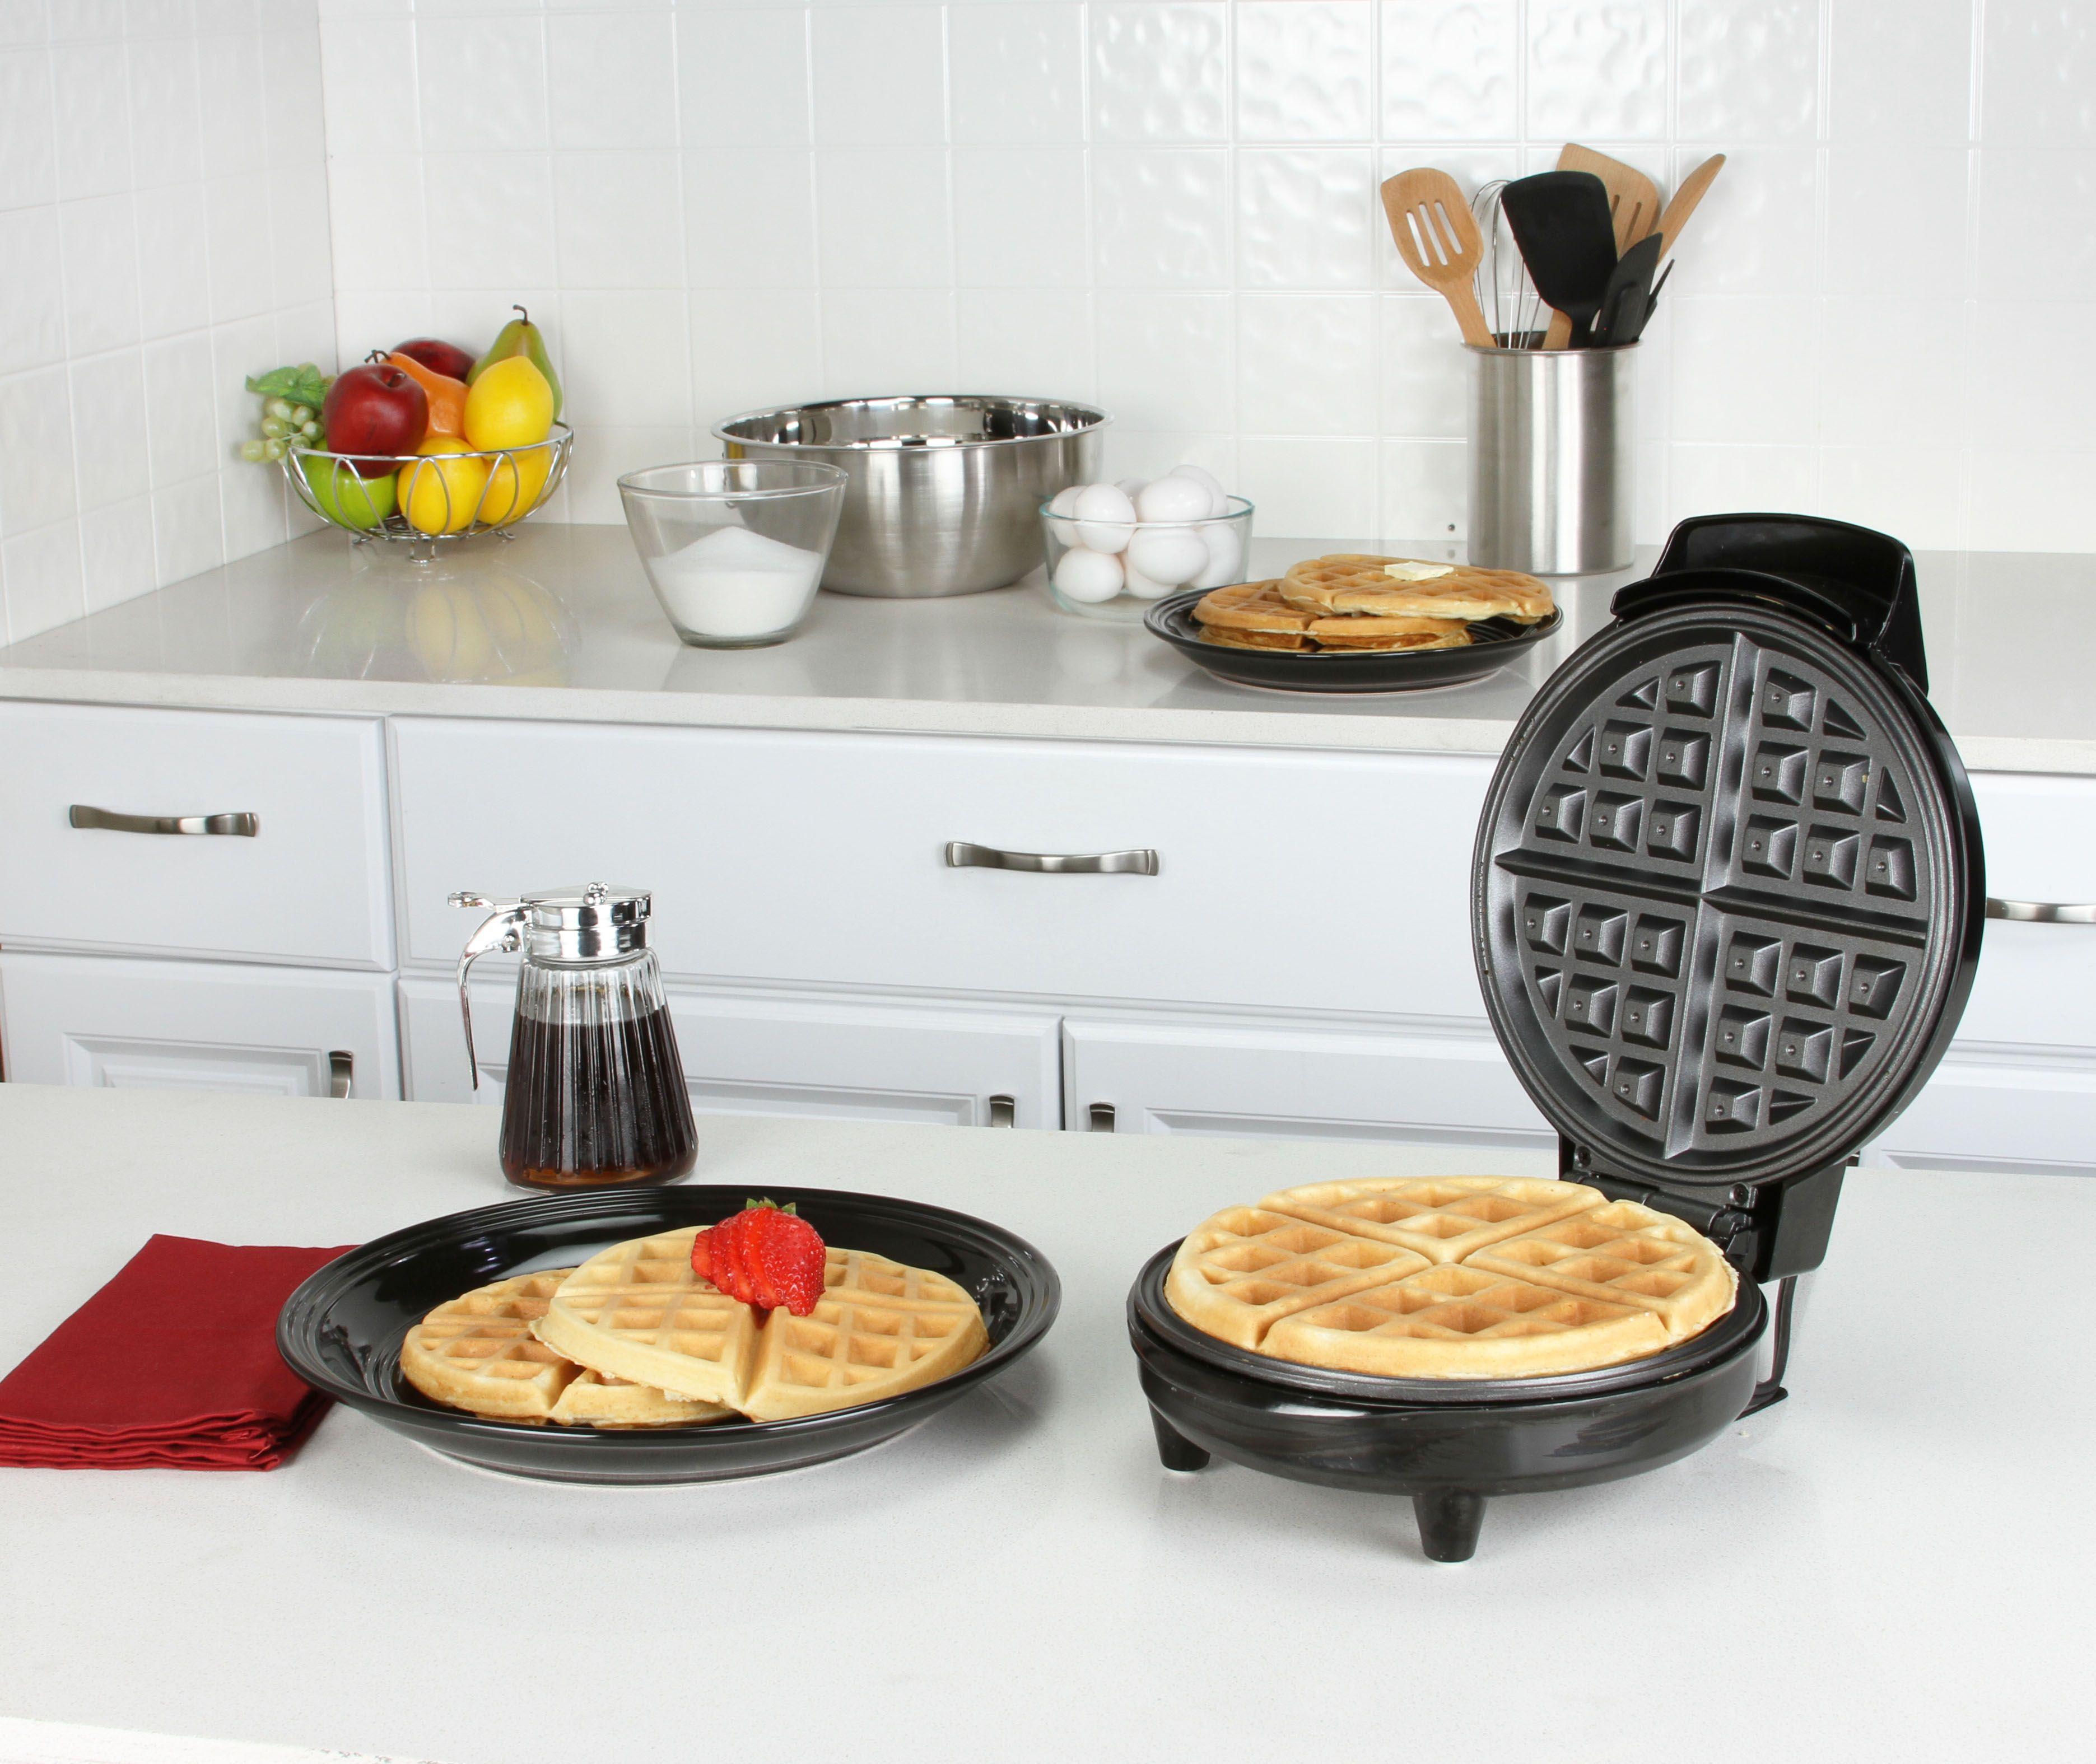 The Kalorik Traditional Belgian Waffle Maker Makes Large Fluffy Belgian Style Waffles With E Double Belgian Waffle Maker Belgian Waffle Maker Belgian Waffles